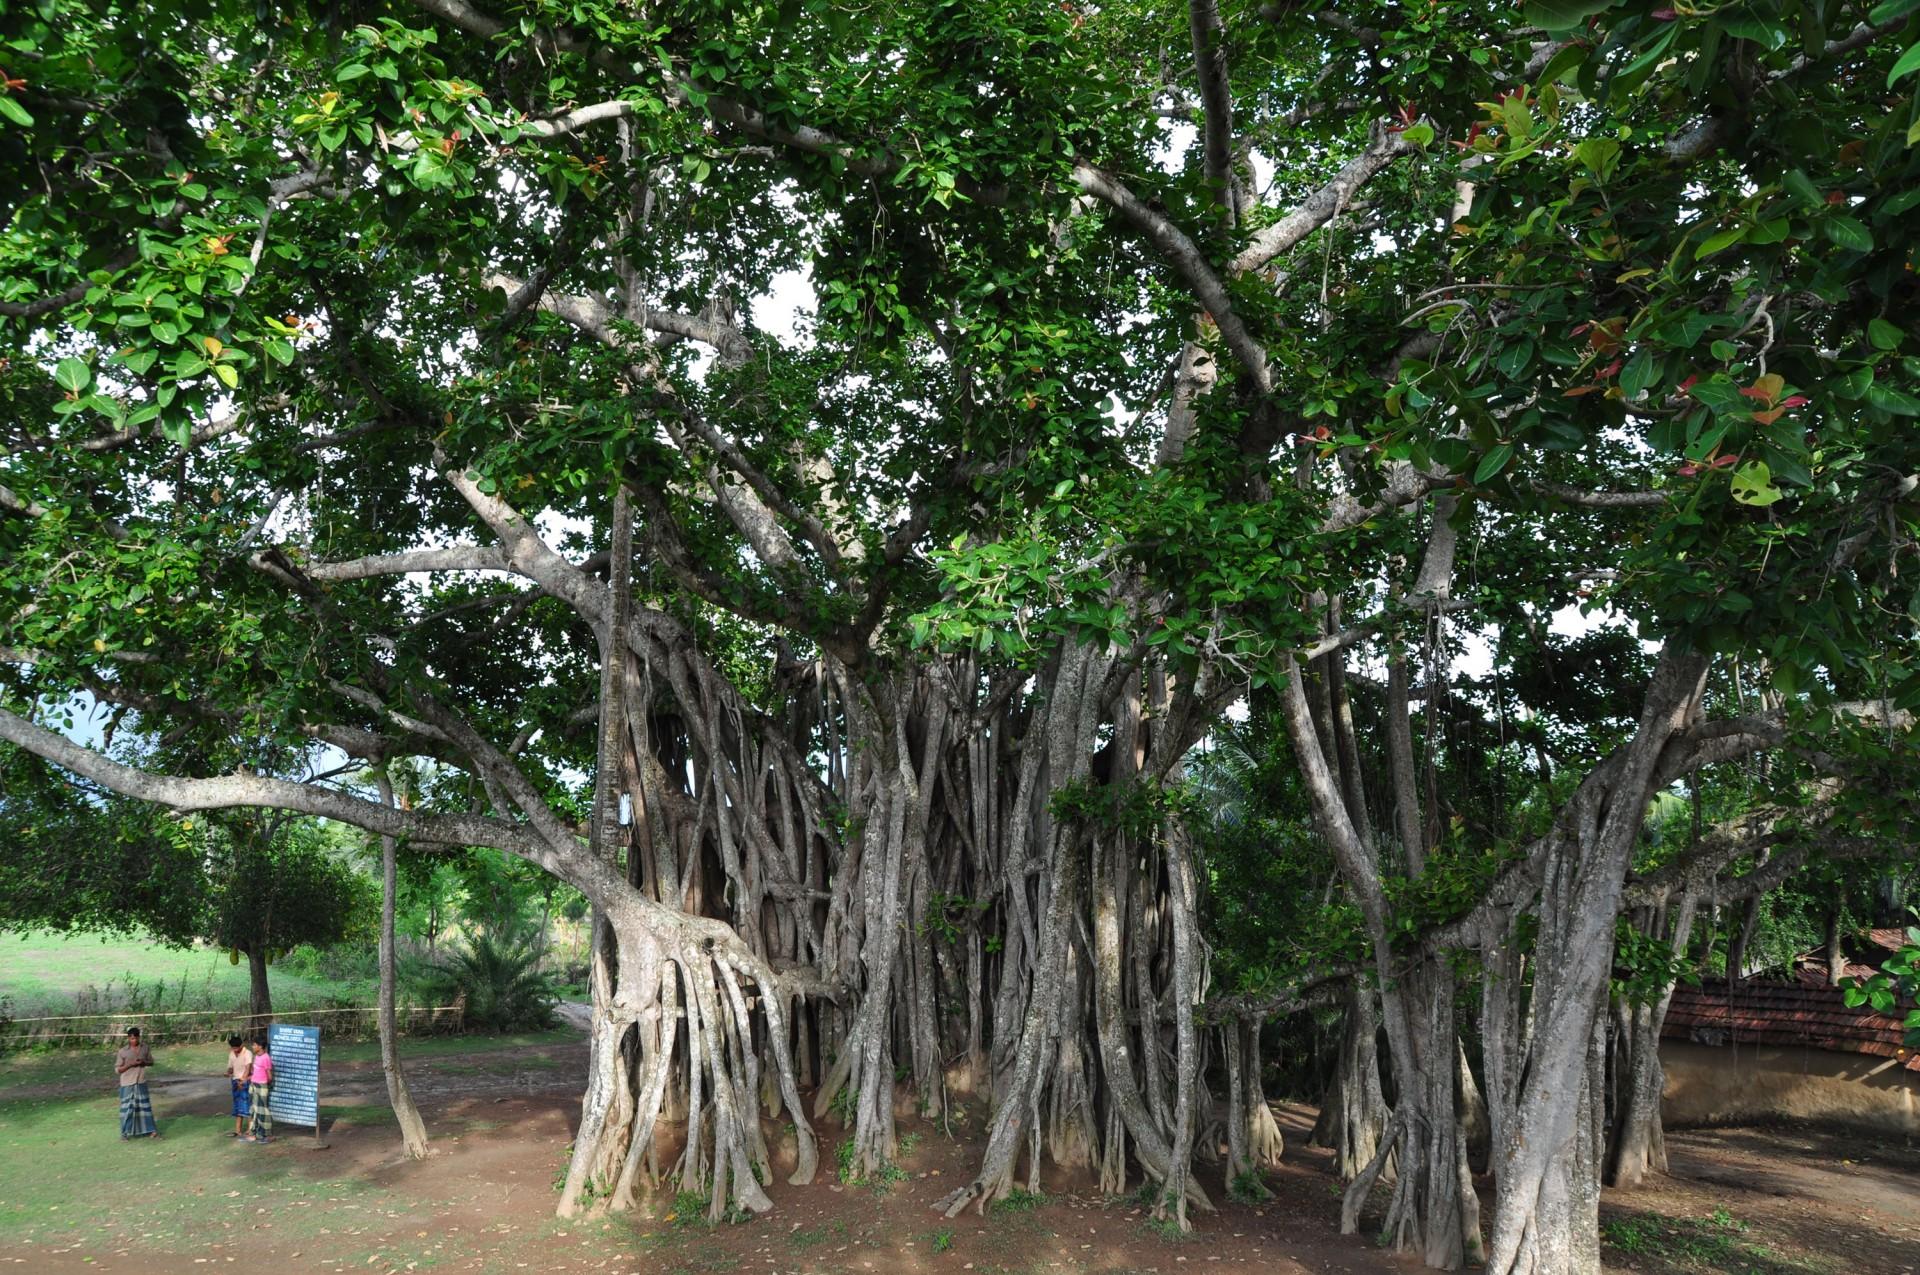 017 Banyan Tree Description Of Trees For Essays Essay Striking 1920